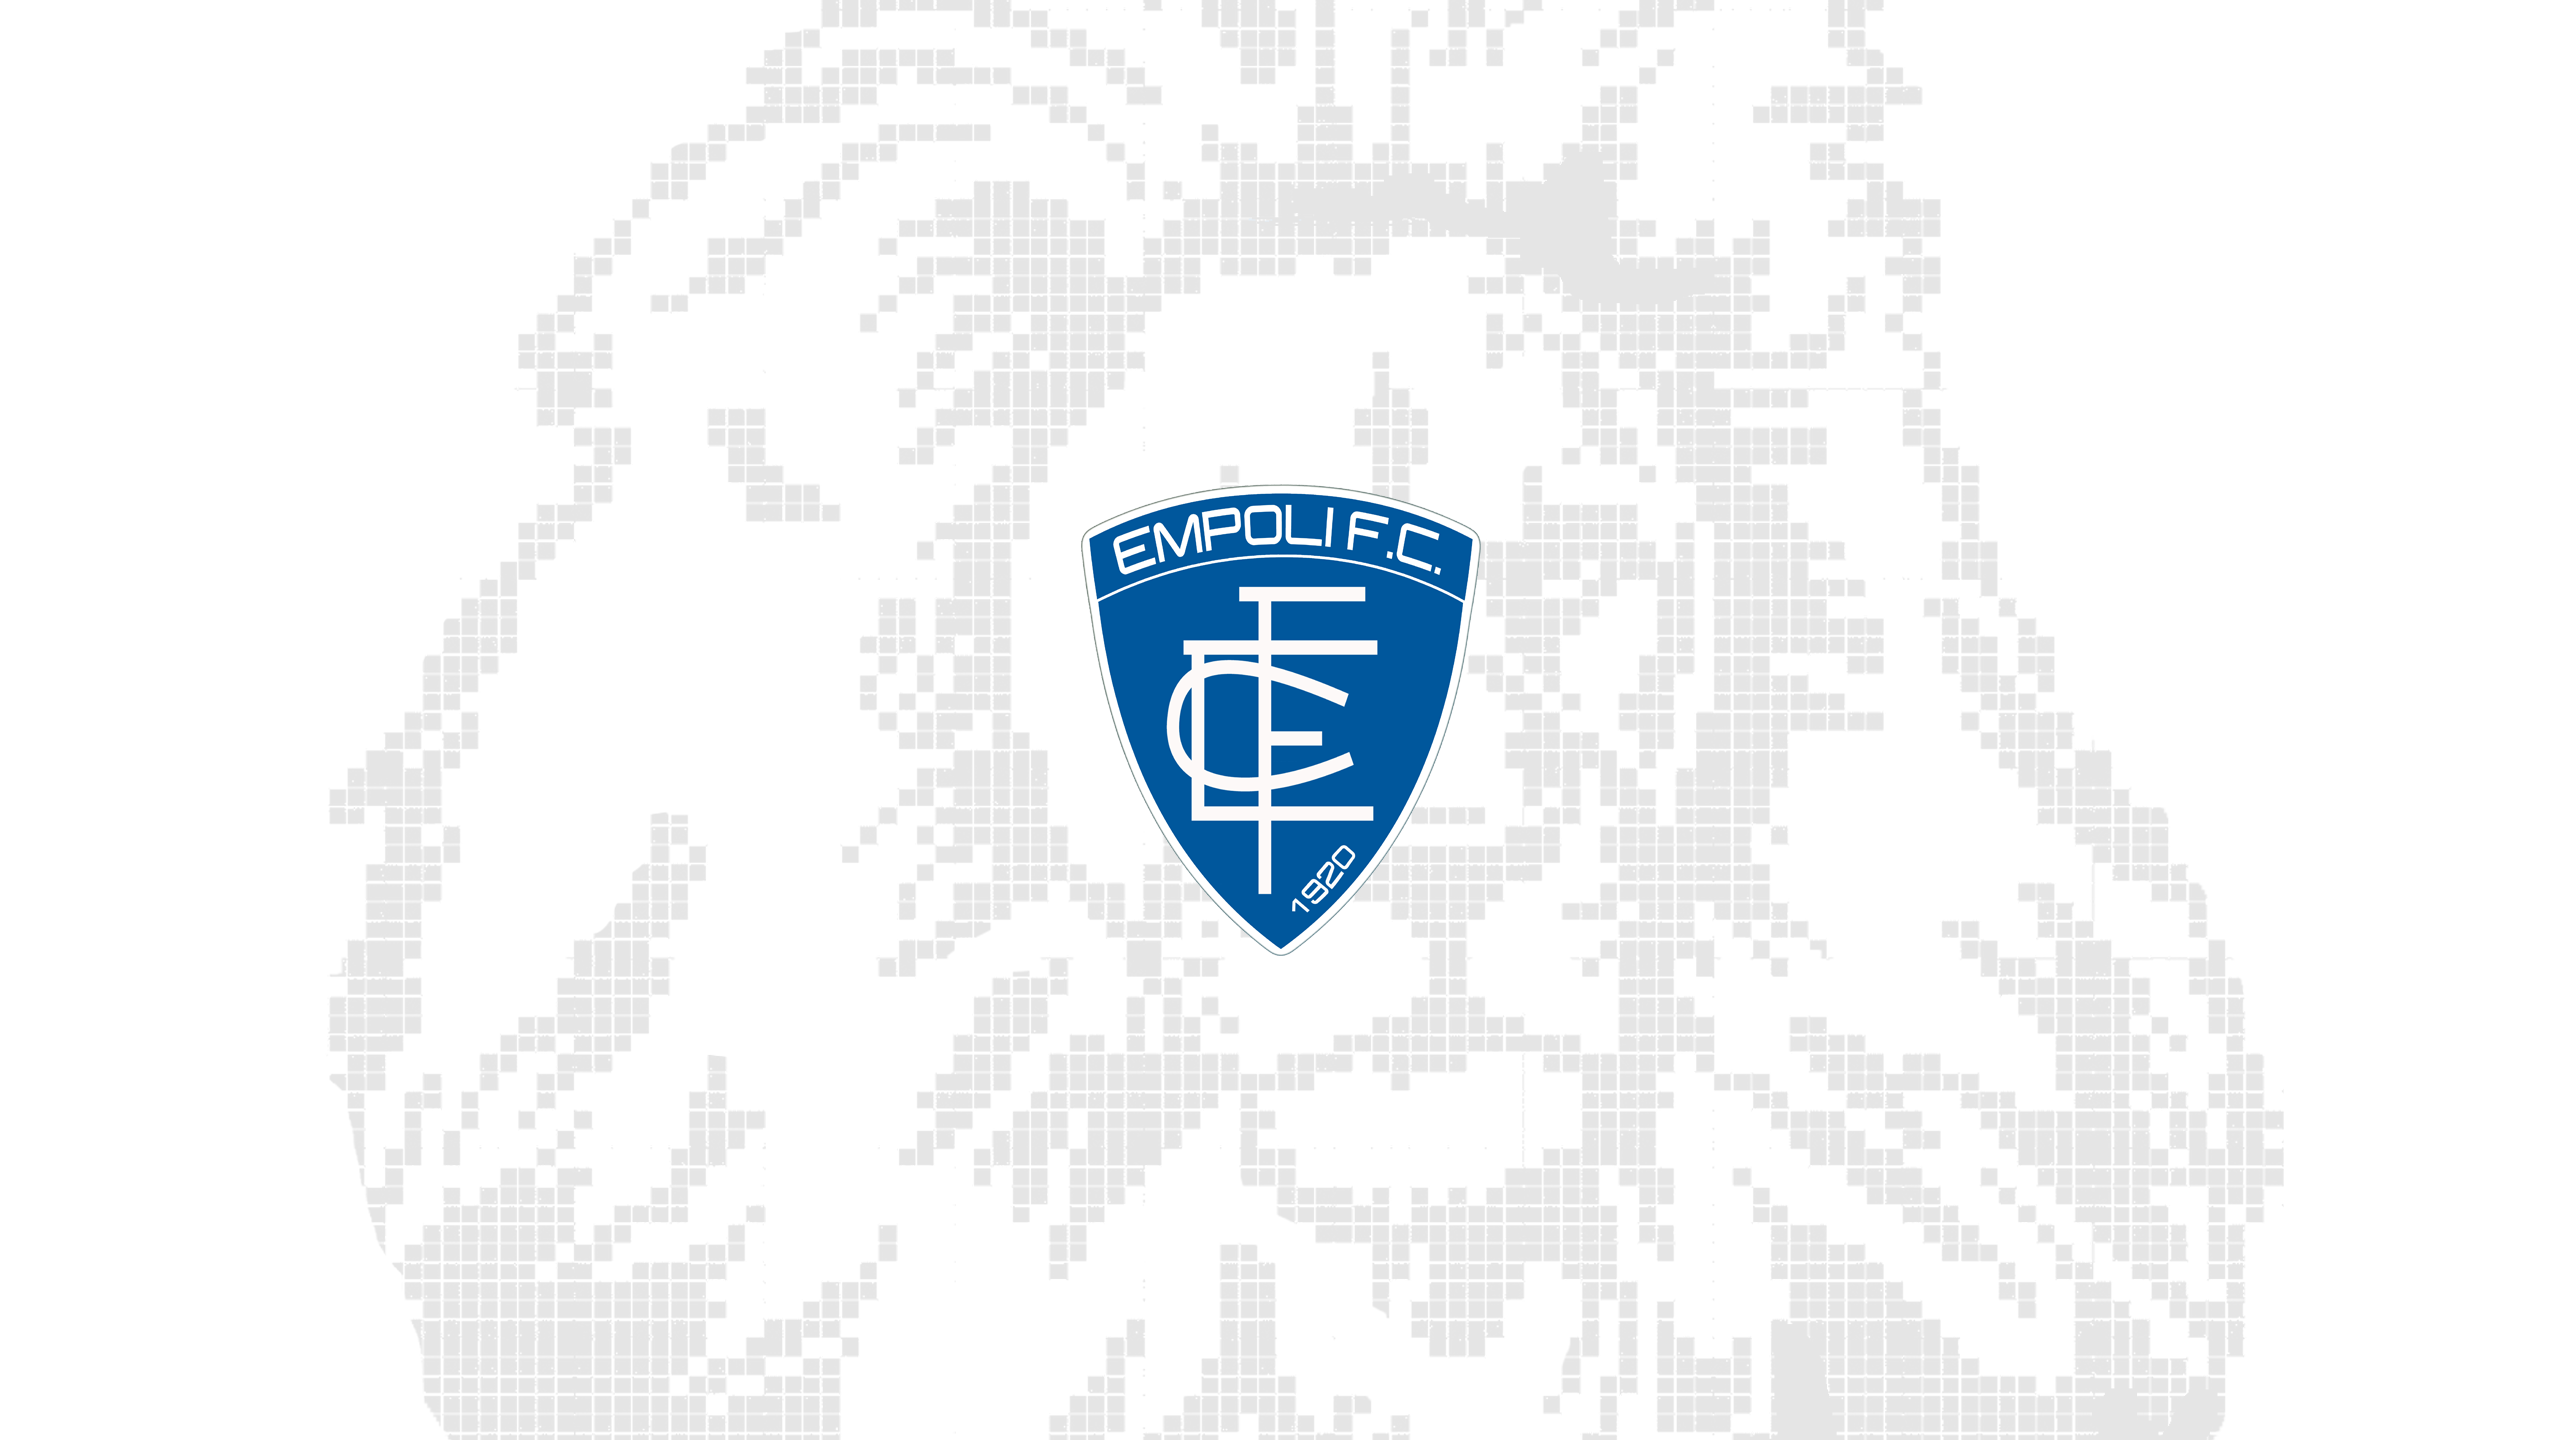 Empoli FC (Away)